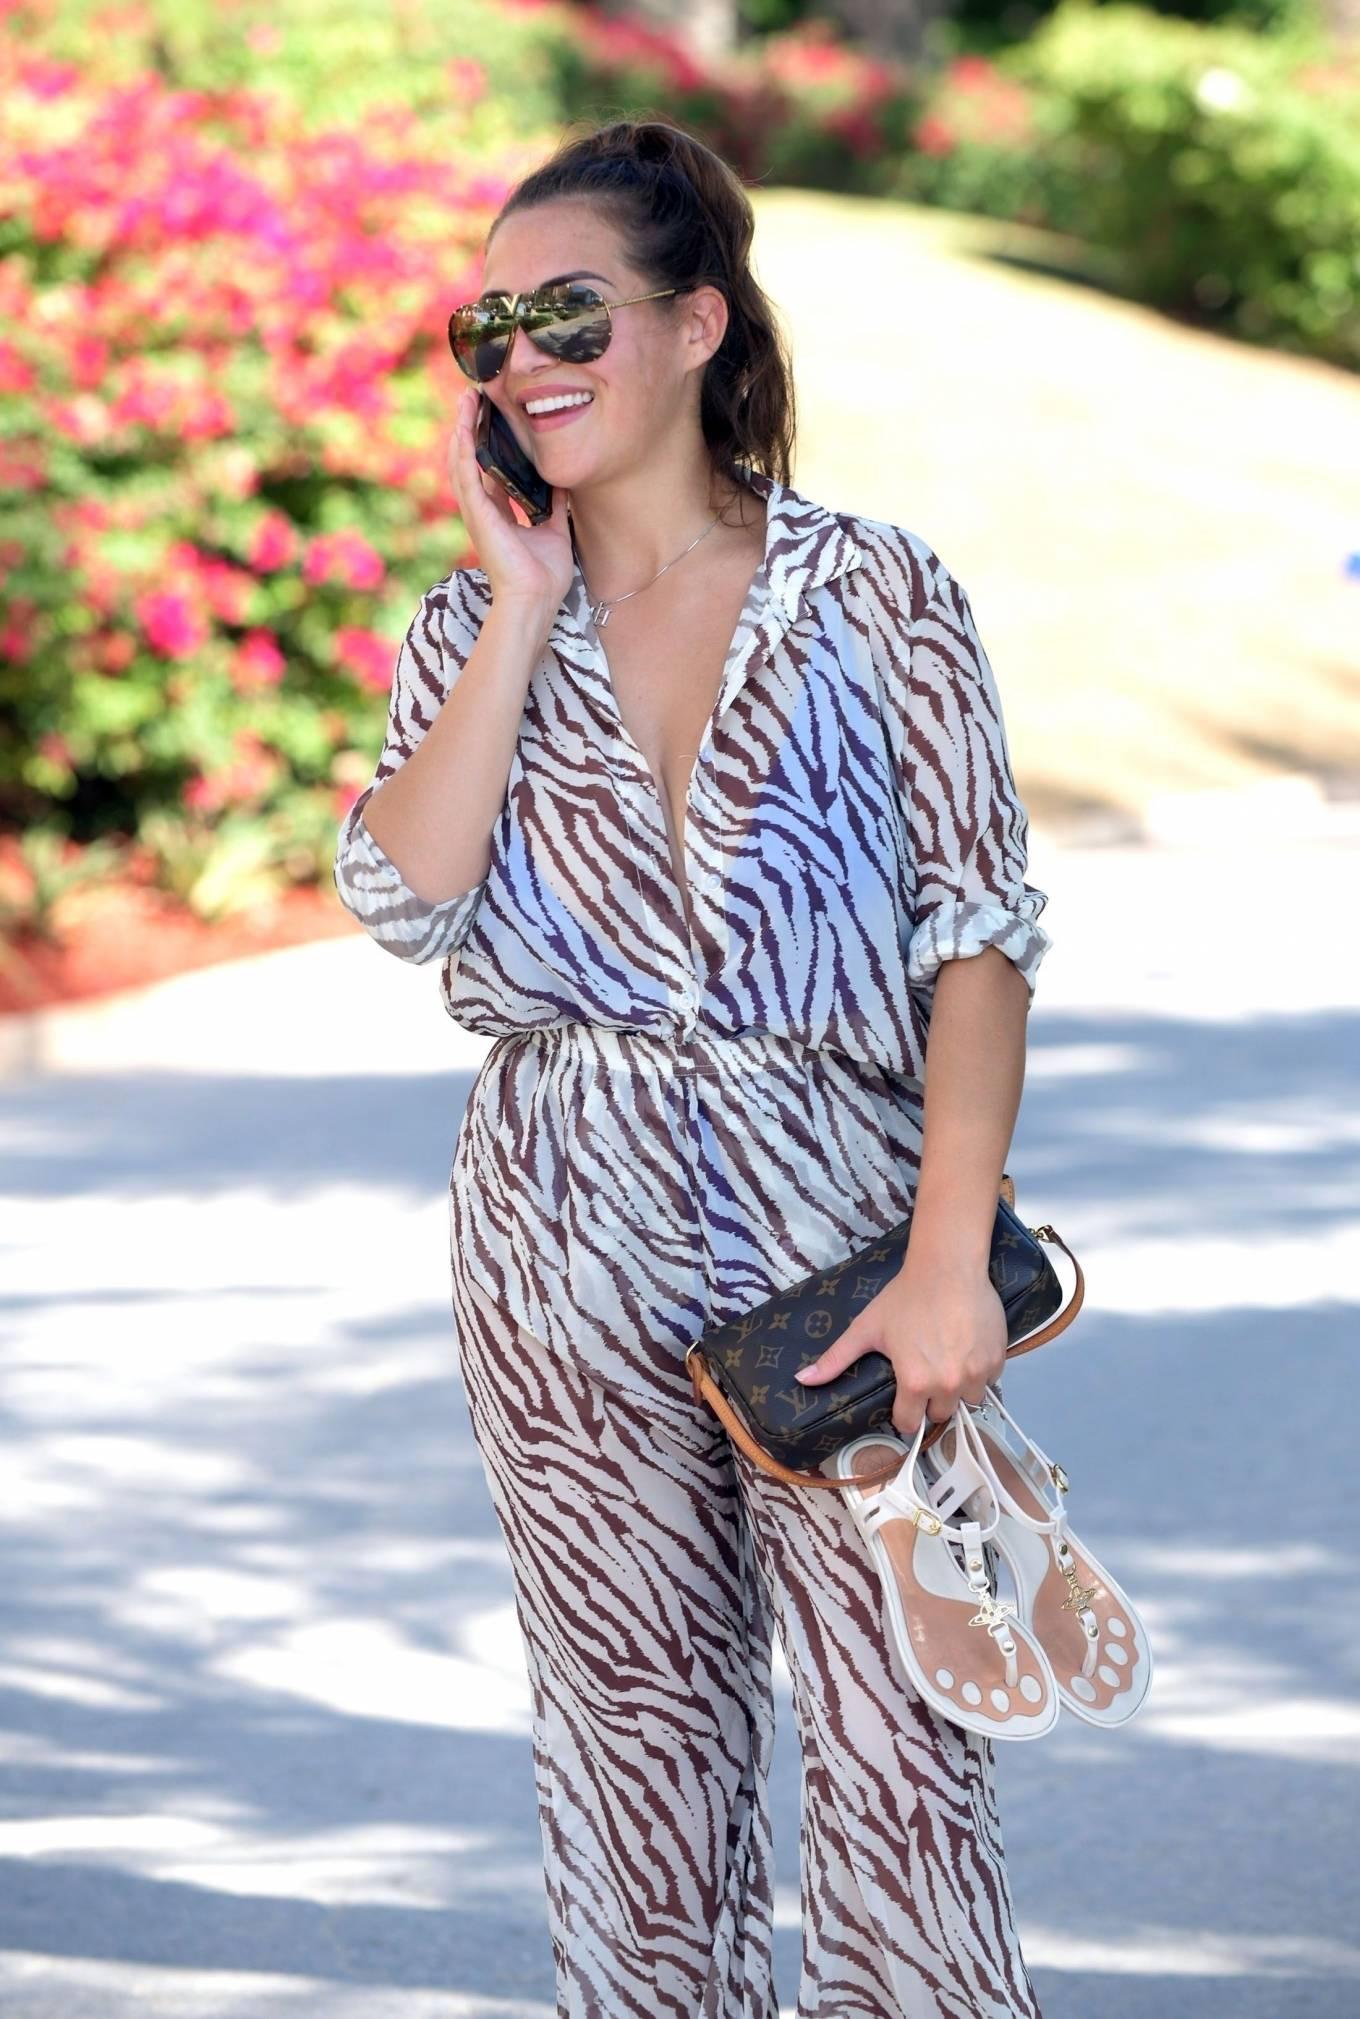 Chloe Goodman 2020 : Chloe Goodman – In a zebra print jumpsuit out on holiday in Dubai-02